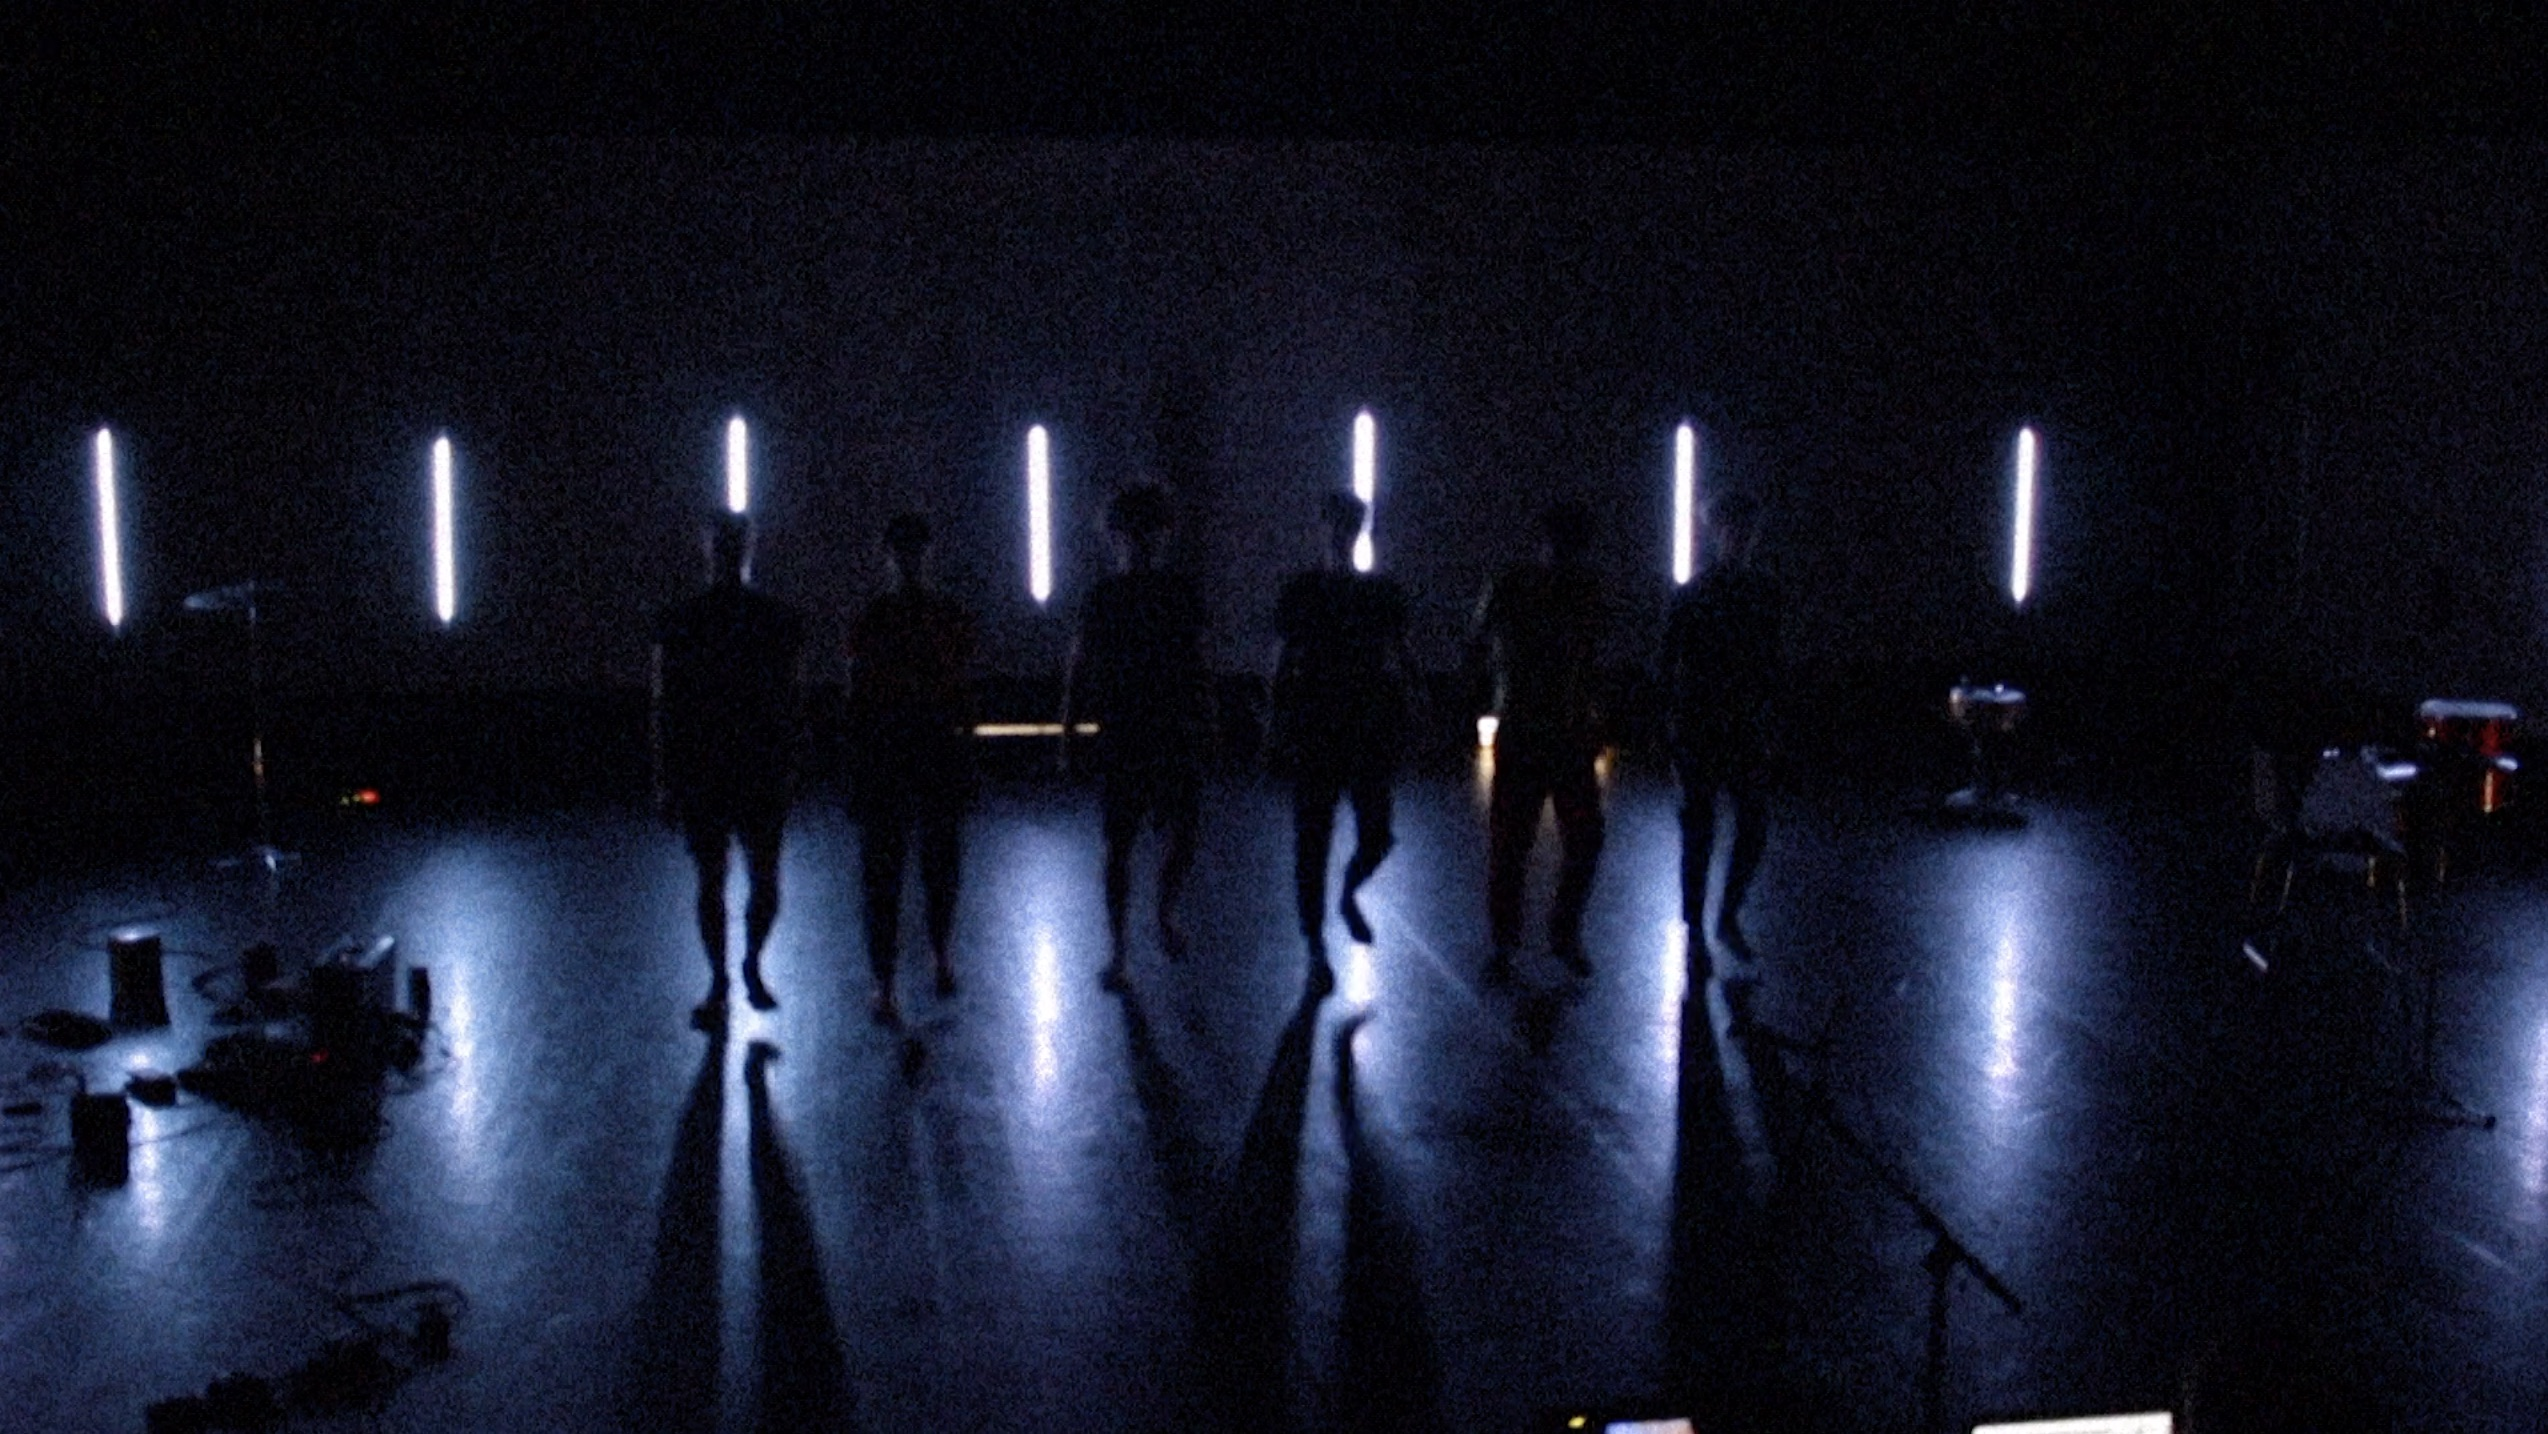 Teaser 'COCO' JULIEN DESPREZ (Rudy Etienne, 2019)